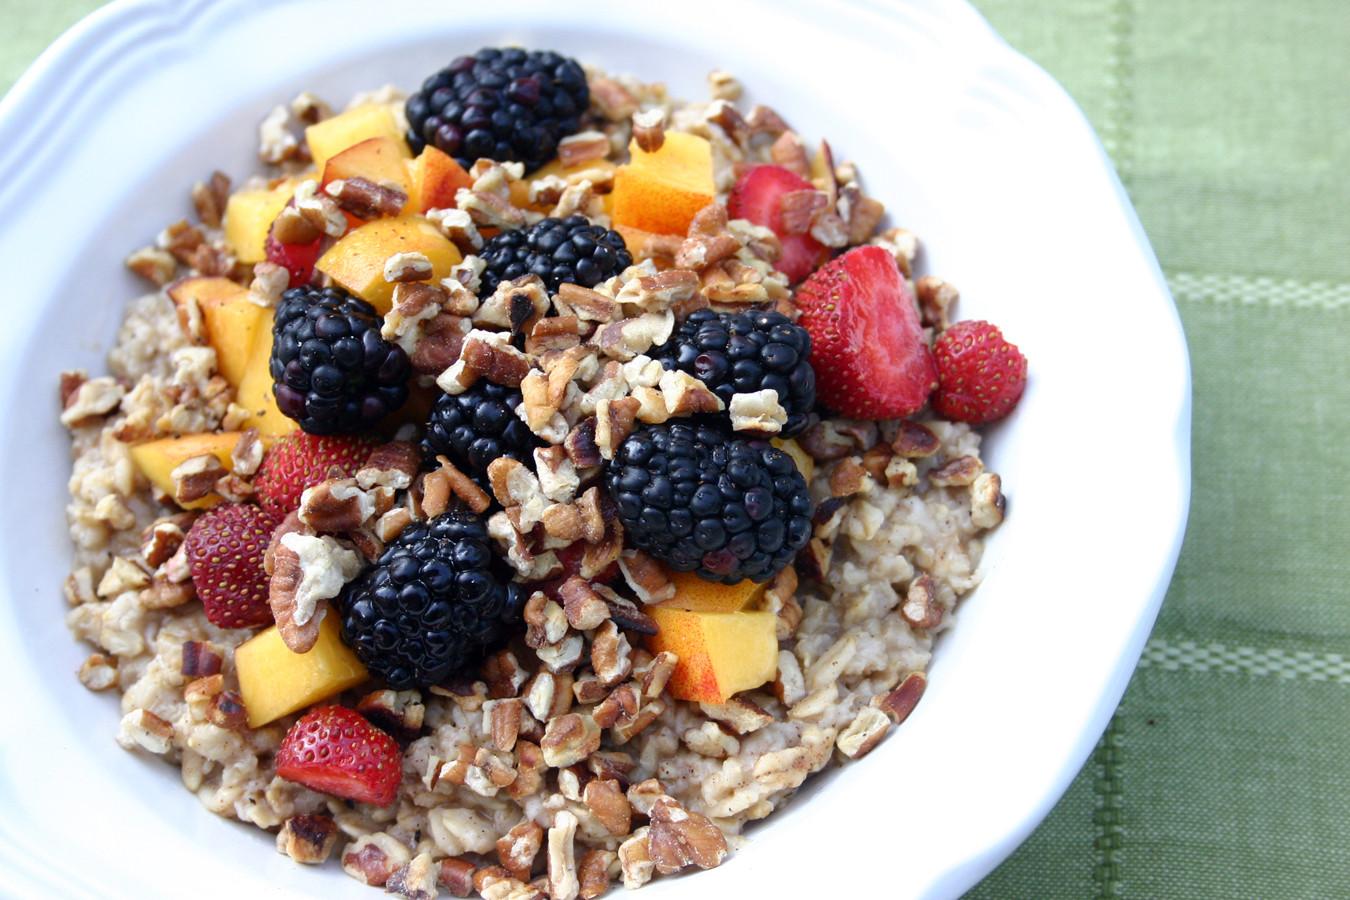 Healthy Oatmeal Breakfast  Balanced Weekend Breakfasts Yum